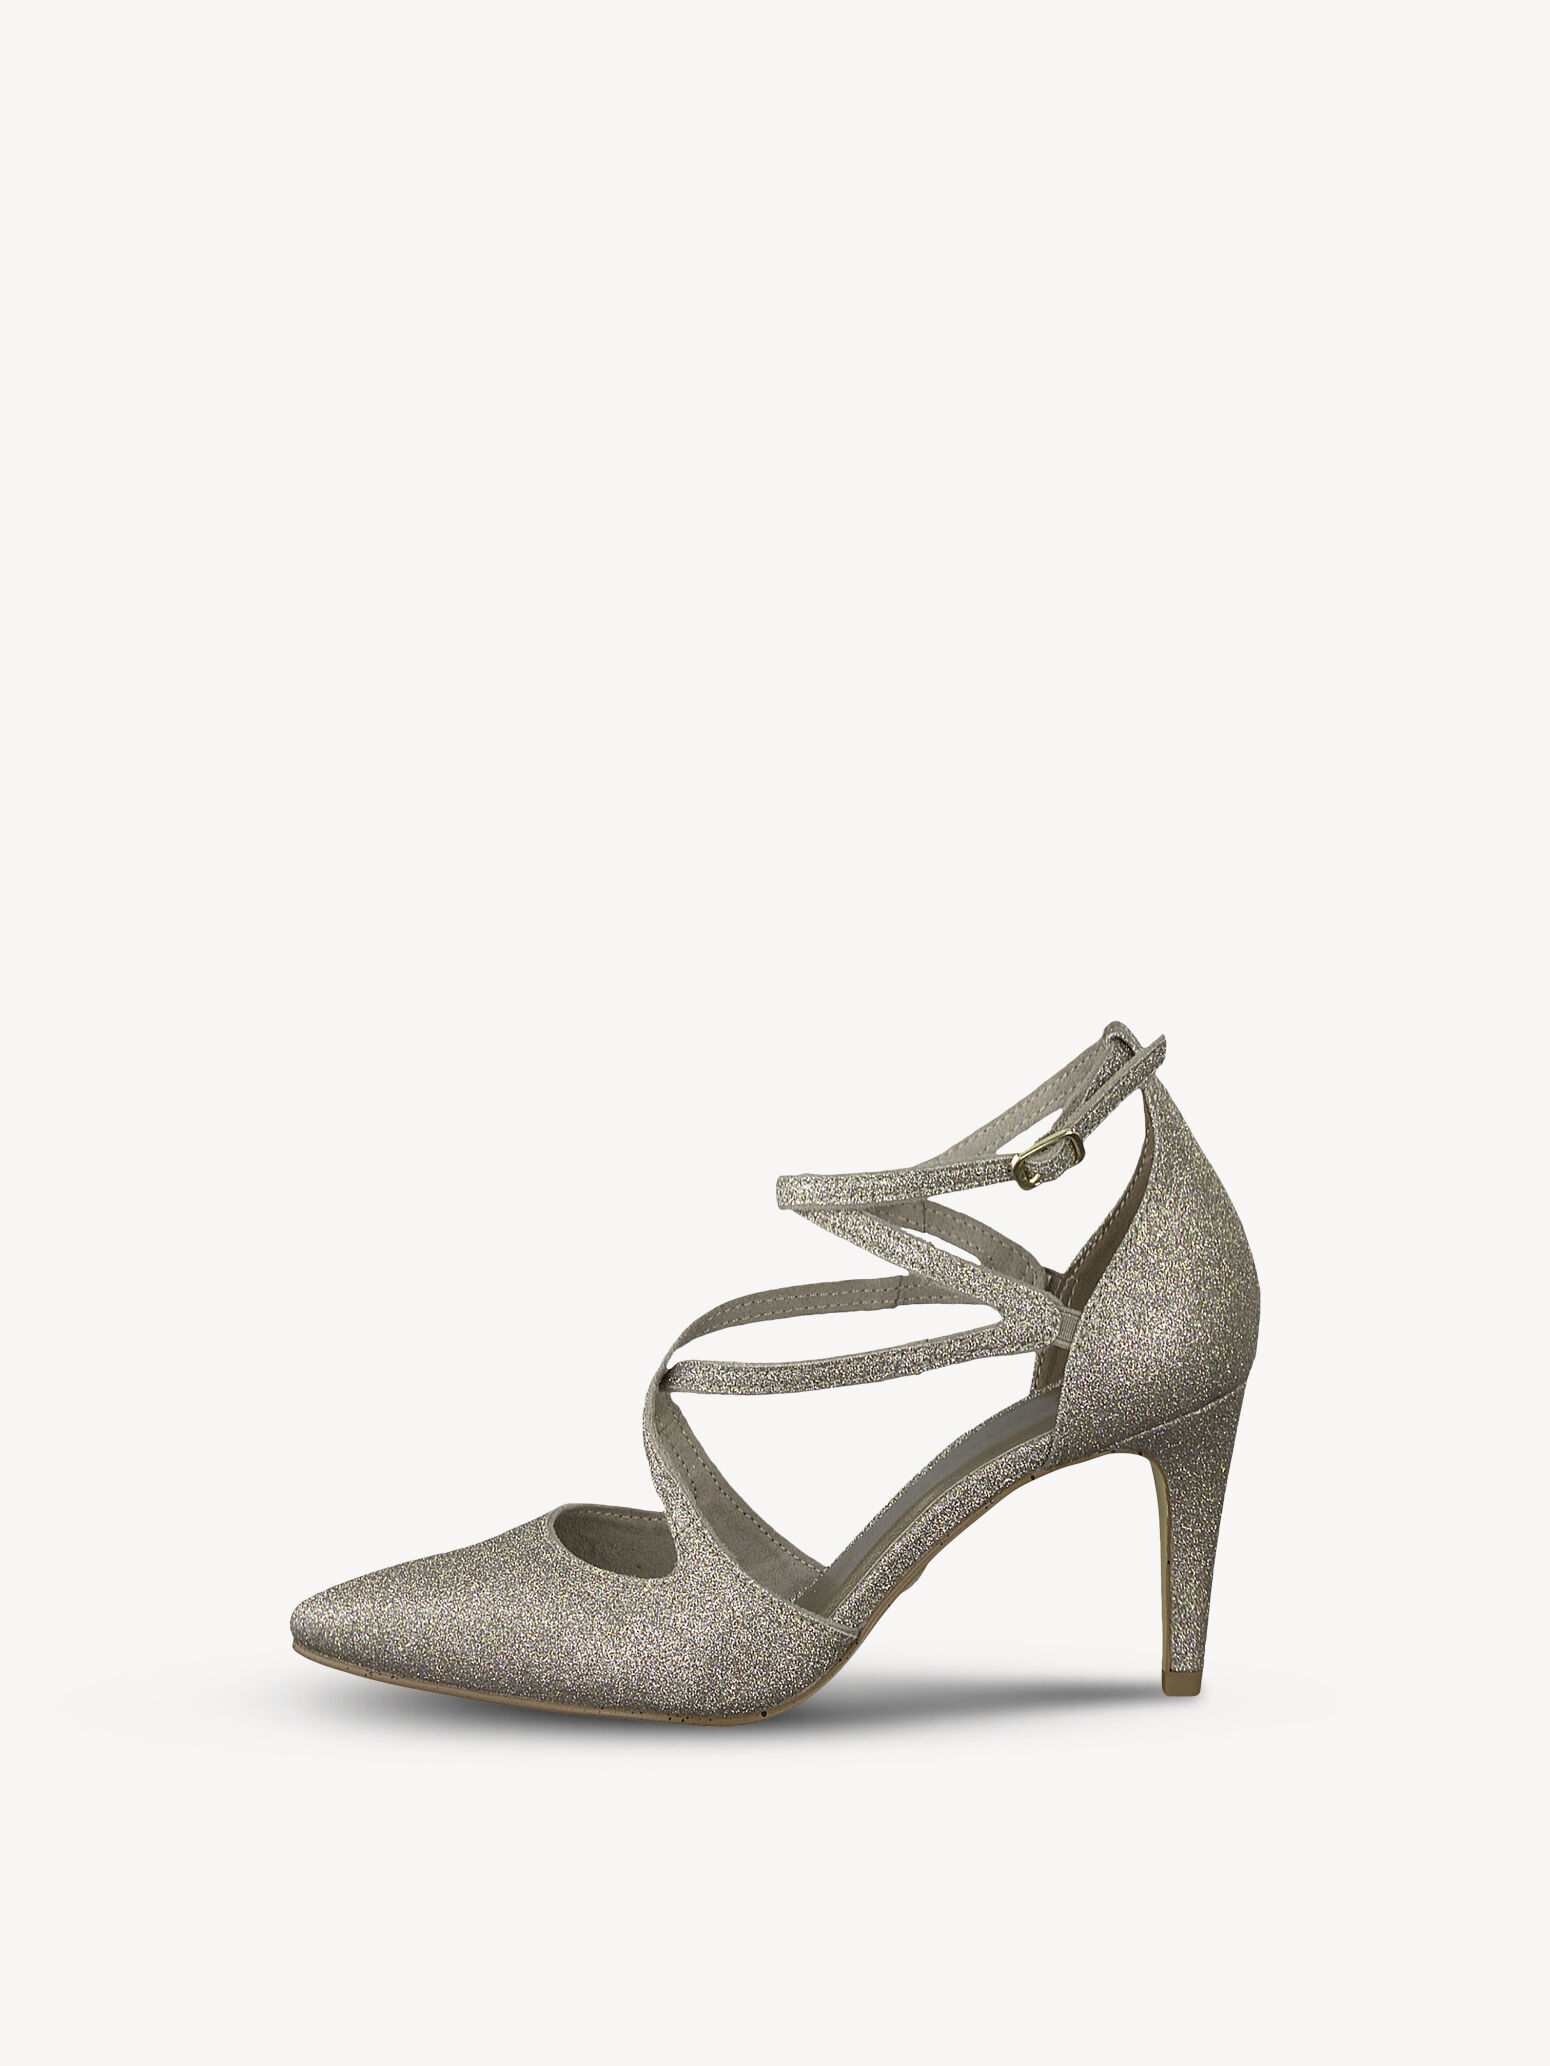 Tamaris Tamaris Escarpins Femmes Femmes Femmes Chaussures Tamaris Chaussures Escarpins Escarpins Chaussures iOPkuTZX